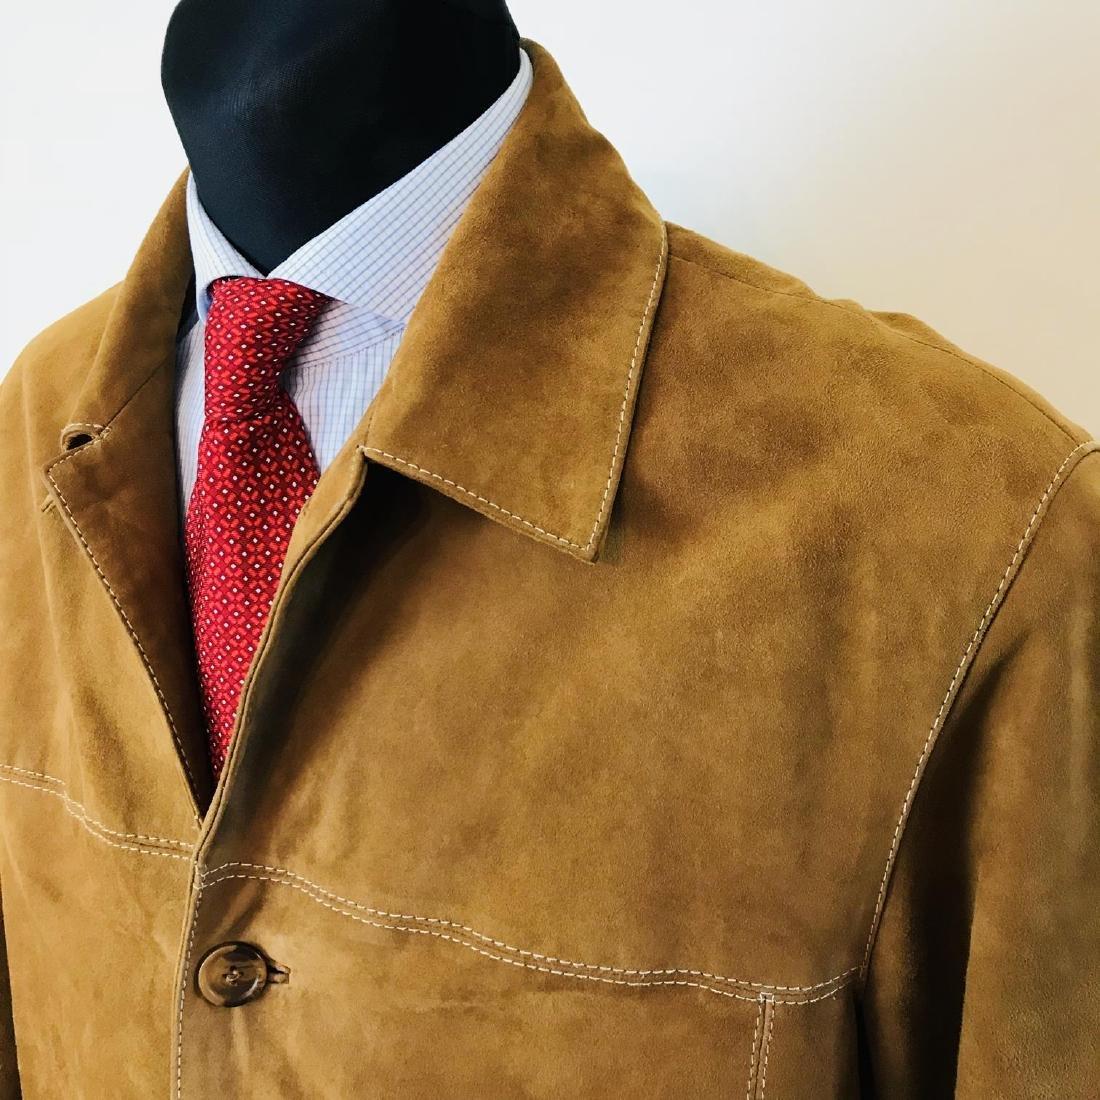 Vintage Men's Brown Suede Leather Jacket Coat Size 40 - 3